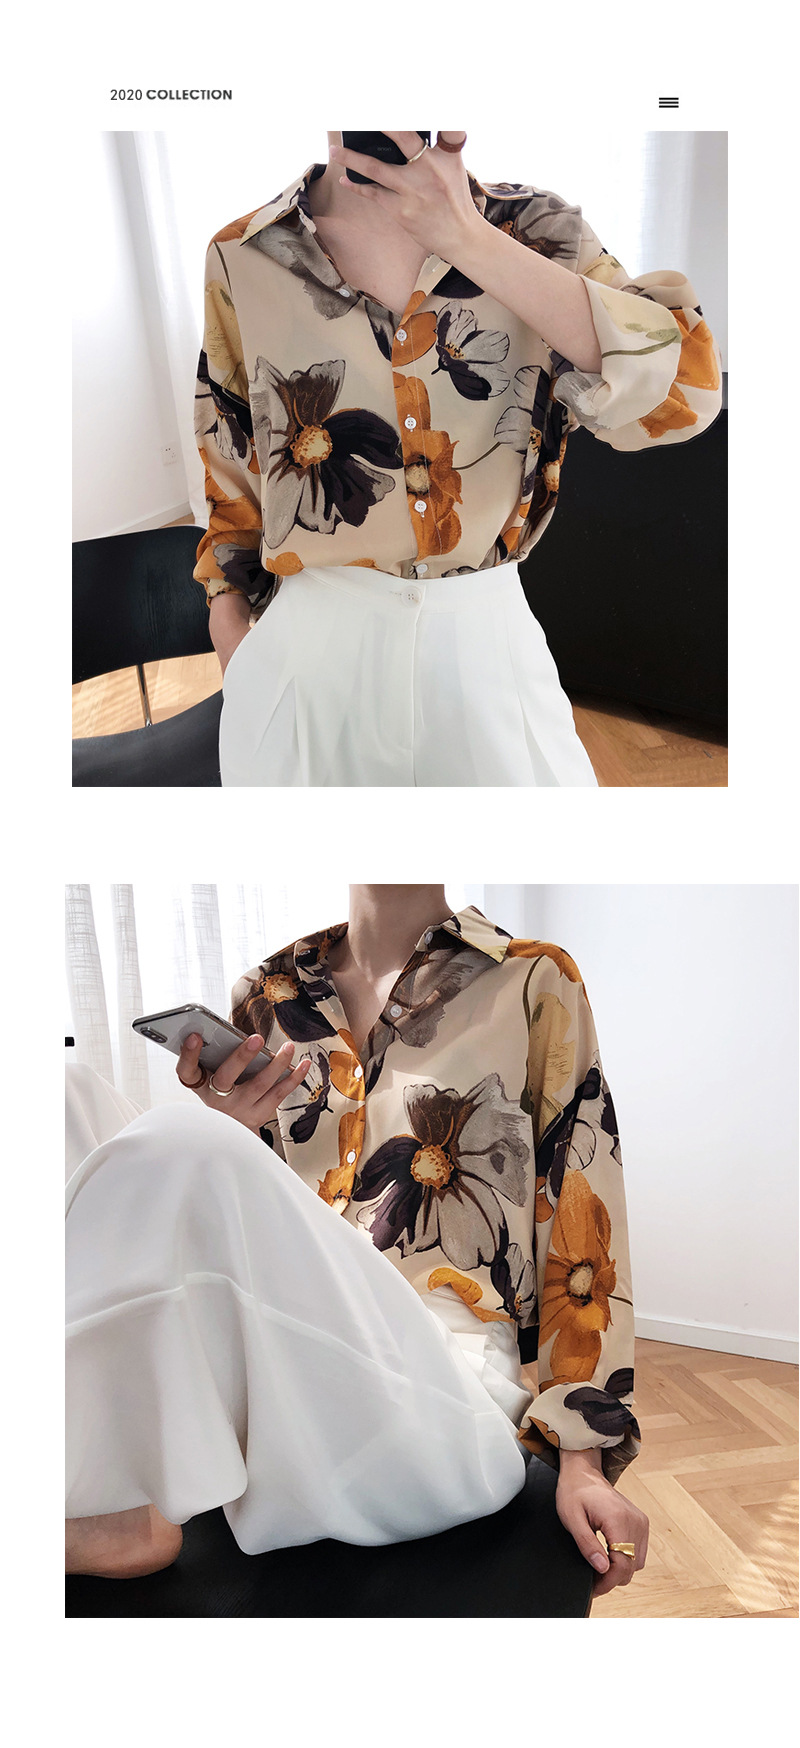 Oil Painting Printed Light Sunscreen Chiffon Shirt 12